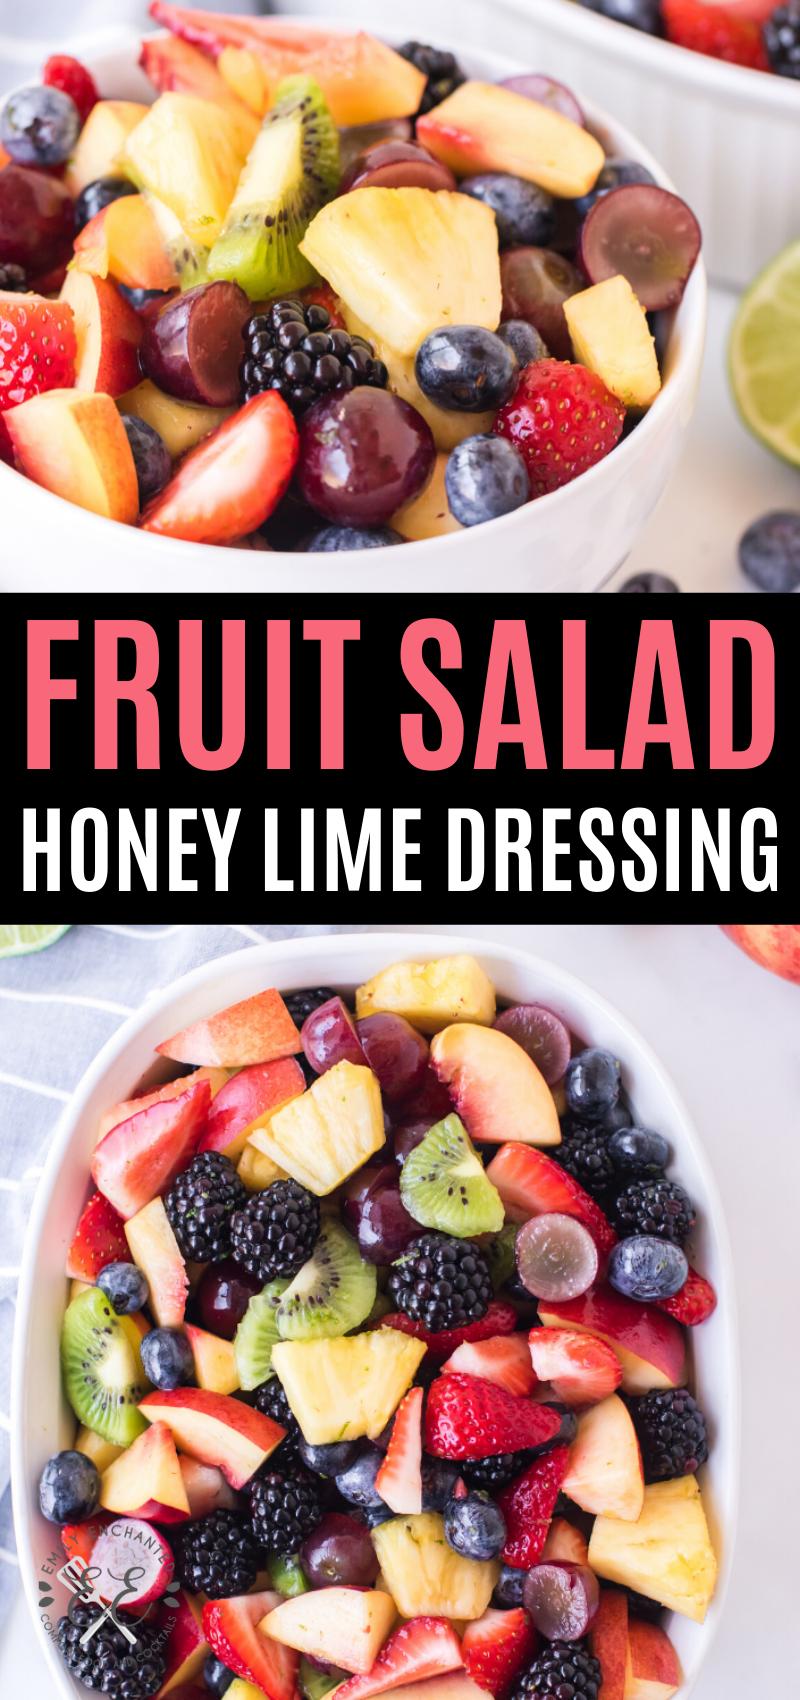 Fresh Fruit Salad Recipe Fruit Salad Recipes Fresh Fruit Salad Honey Recipes